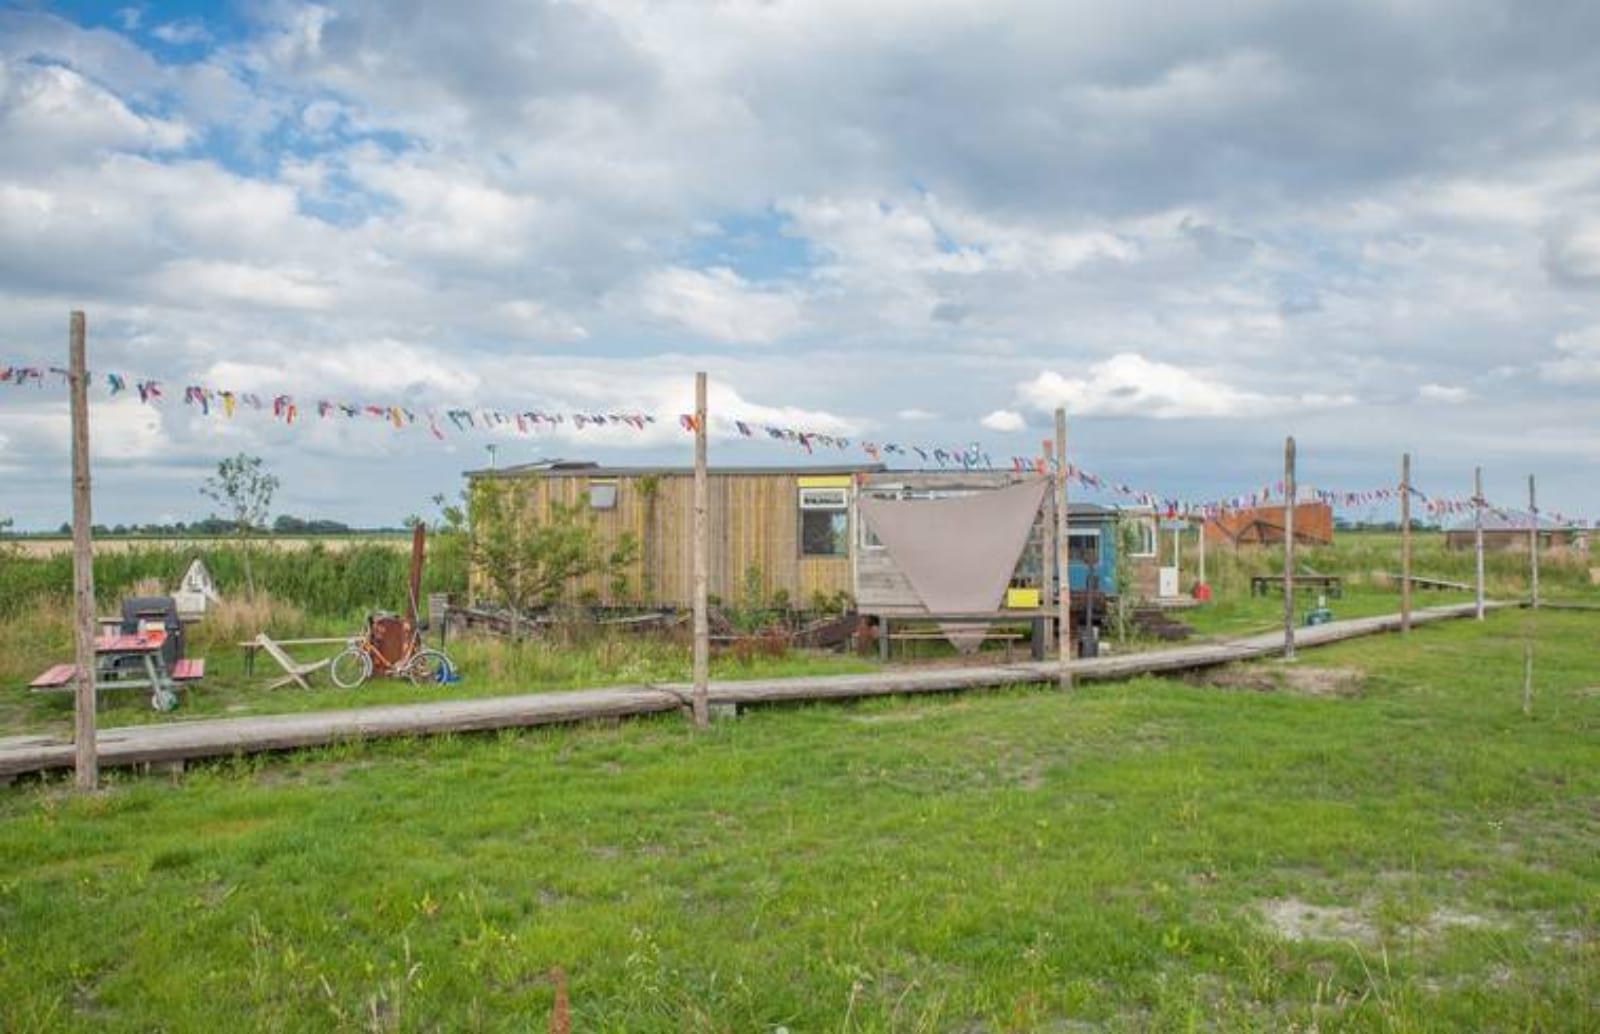 Supertrips - Uniek natuurhuisje in Noord-Holland